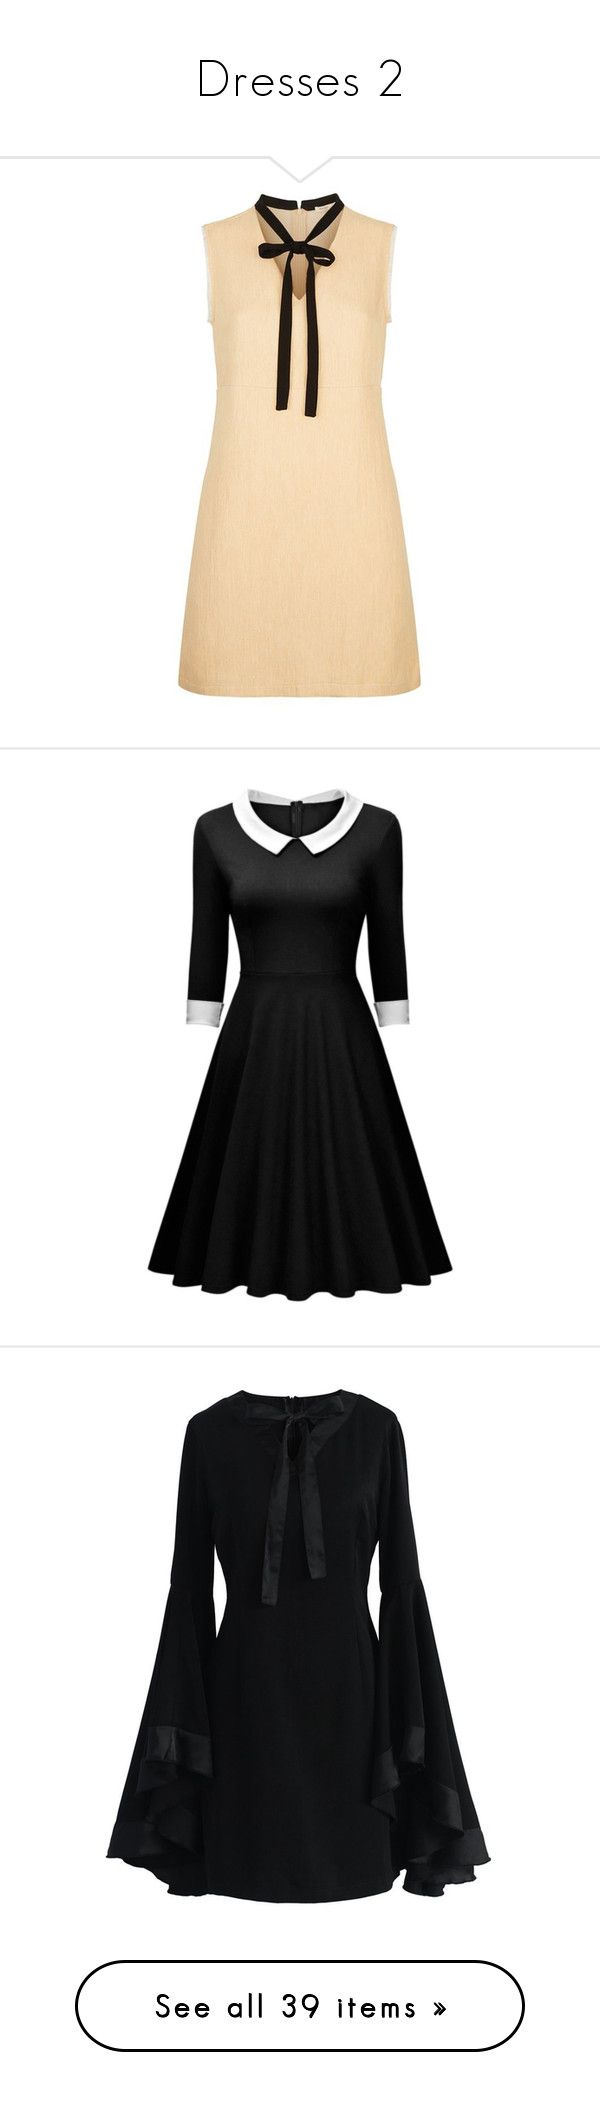 """Dresses 2"" by sailorjerri ❤ liked on Polyvore featuring dresses, beige summer dress, bohemian summer dresses, boho style dresses, beige dress, boho dresses, rosegal, retro dresses, retro-inspired dresses and longsleeve dress"